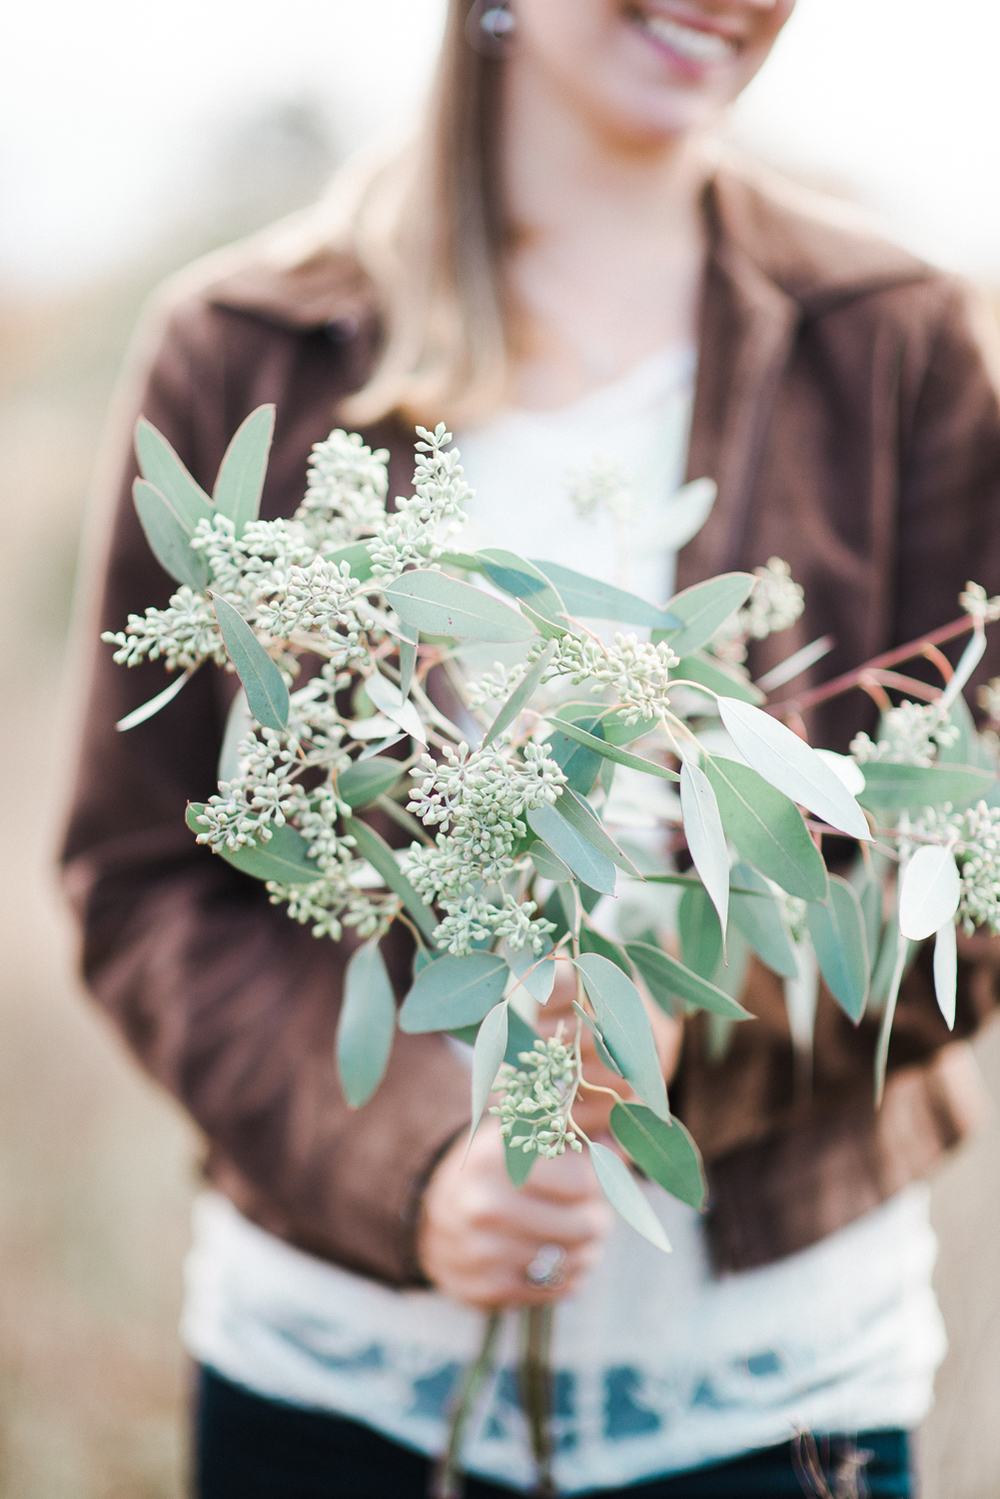 blackcreekflowers-108.jpg